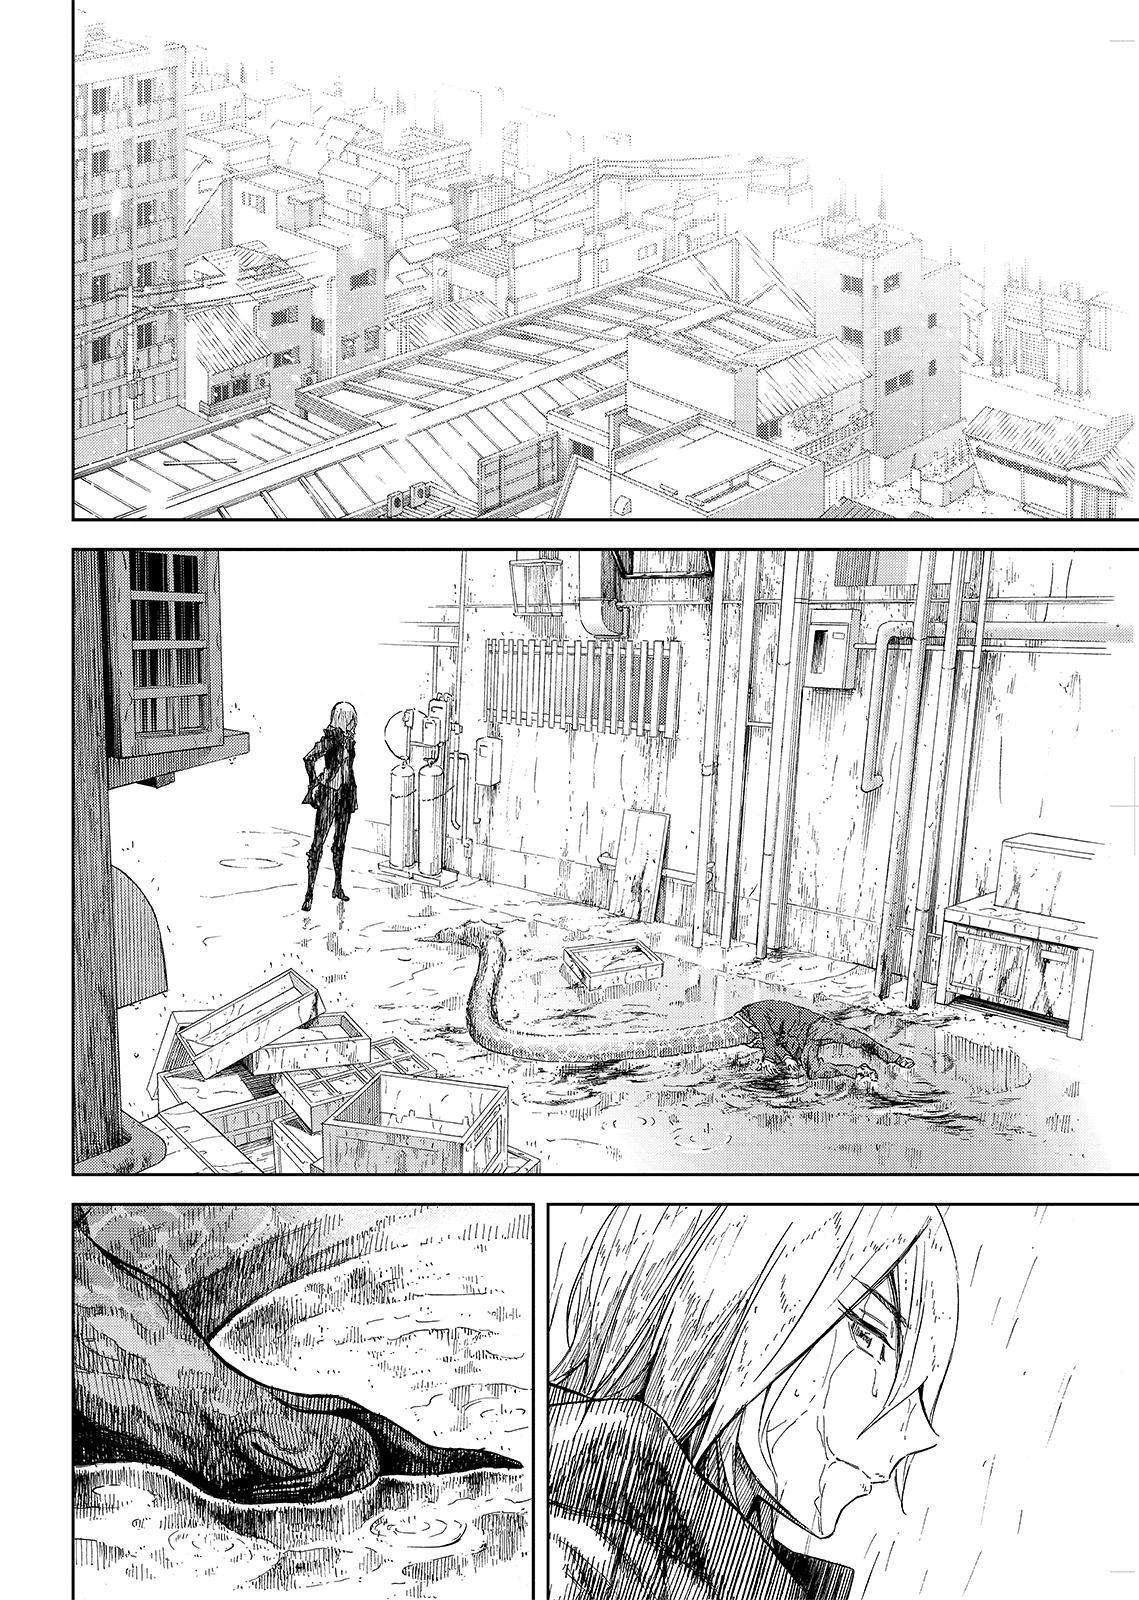 http://c5.ninemanga.com/es_manga/54/16310/392138/410a0338f4f2038cfa92723d64c52900.jpg Page 5